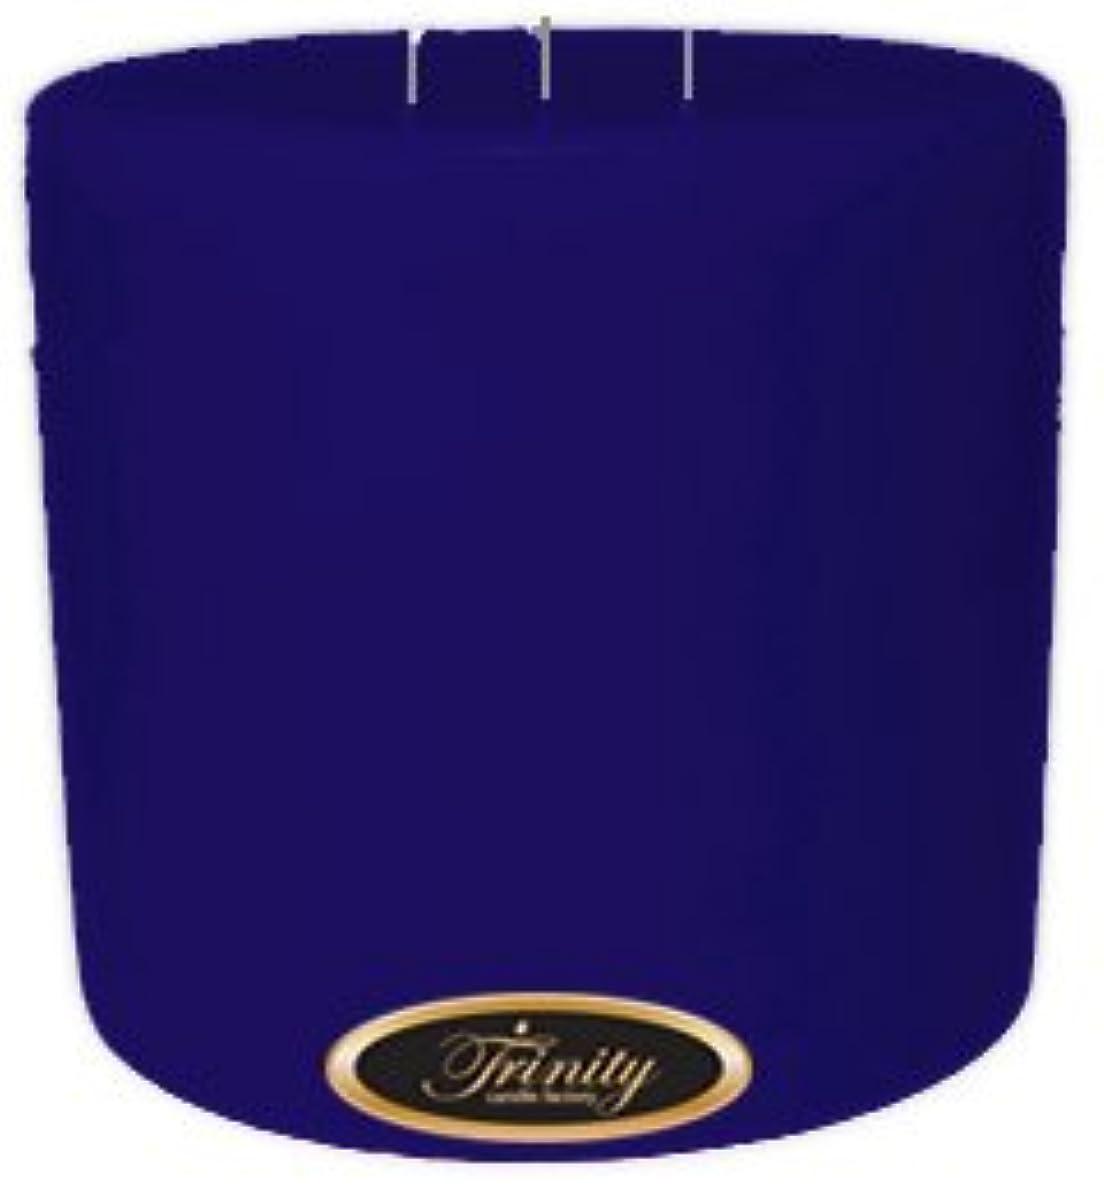 忍耐実験的リルTrinity Candle工場 – Blueberry Fields – Pillar Candle – 6 x 6